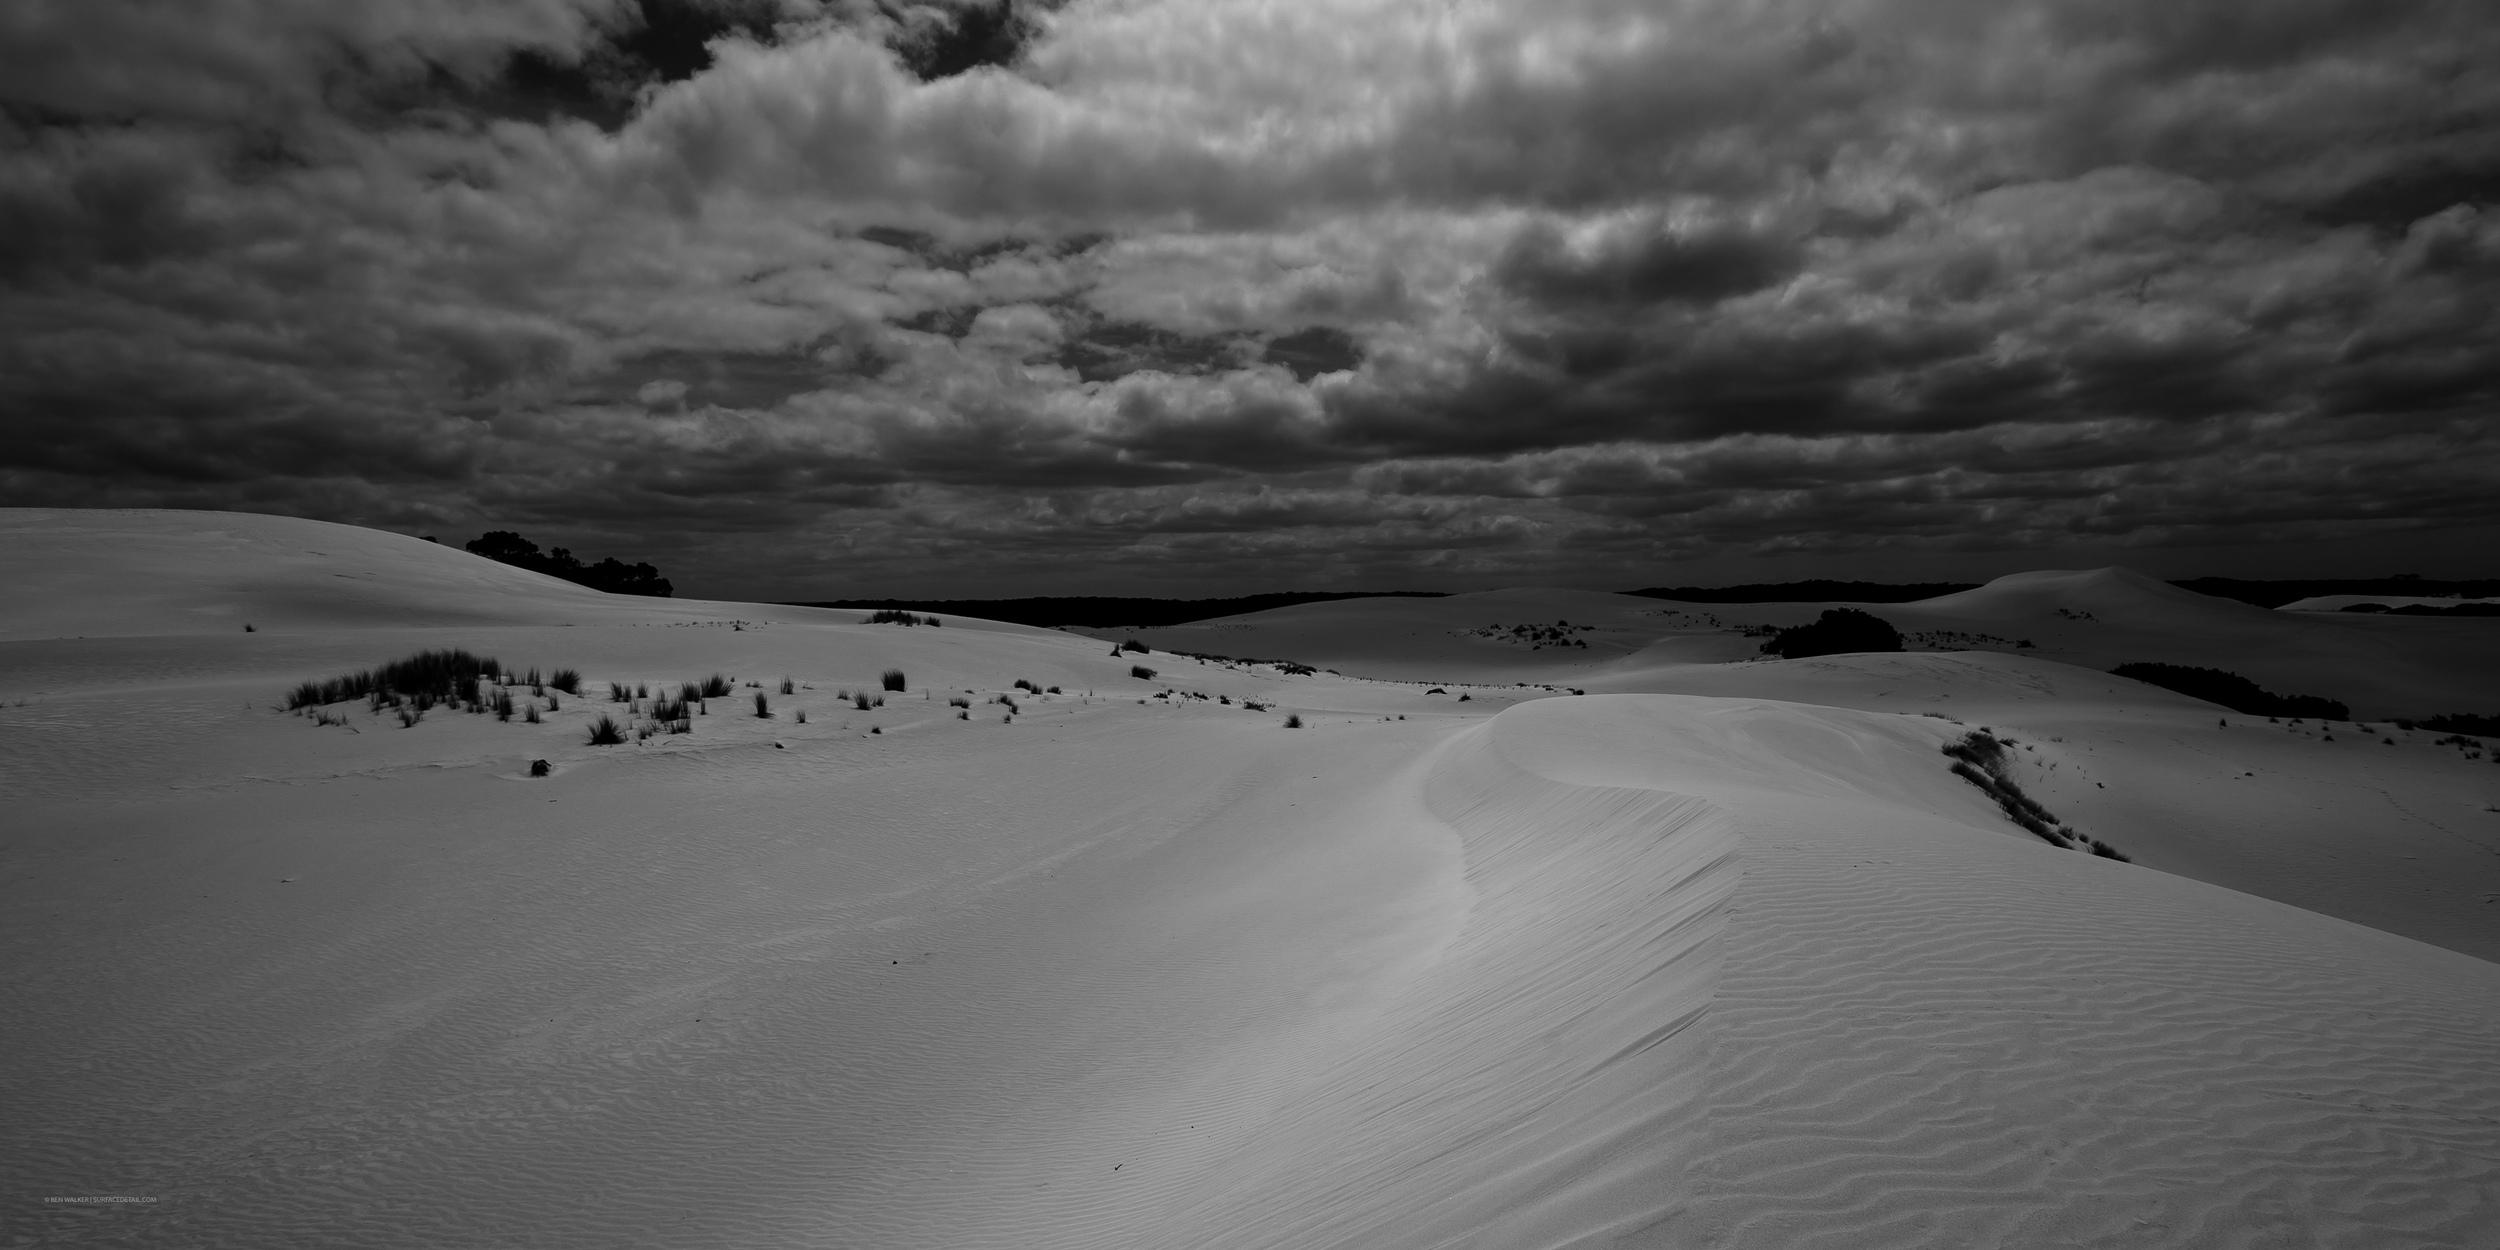 kangaroo_island_20141224_11.jpg